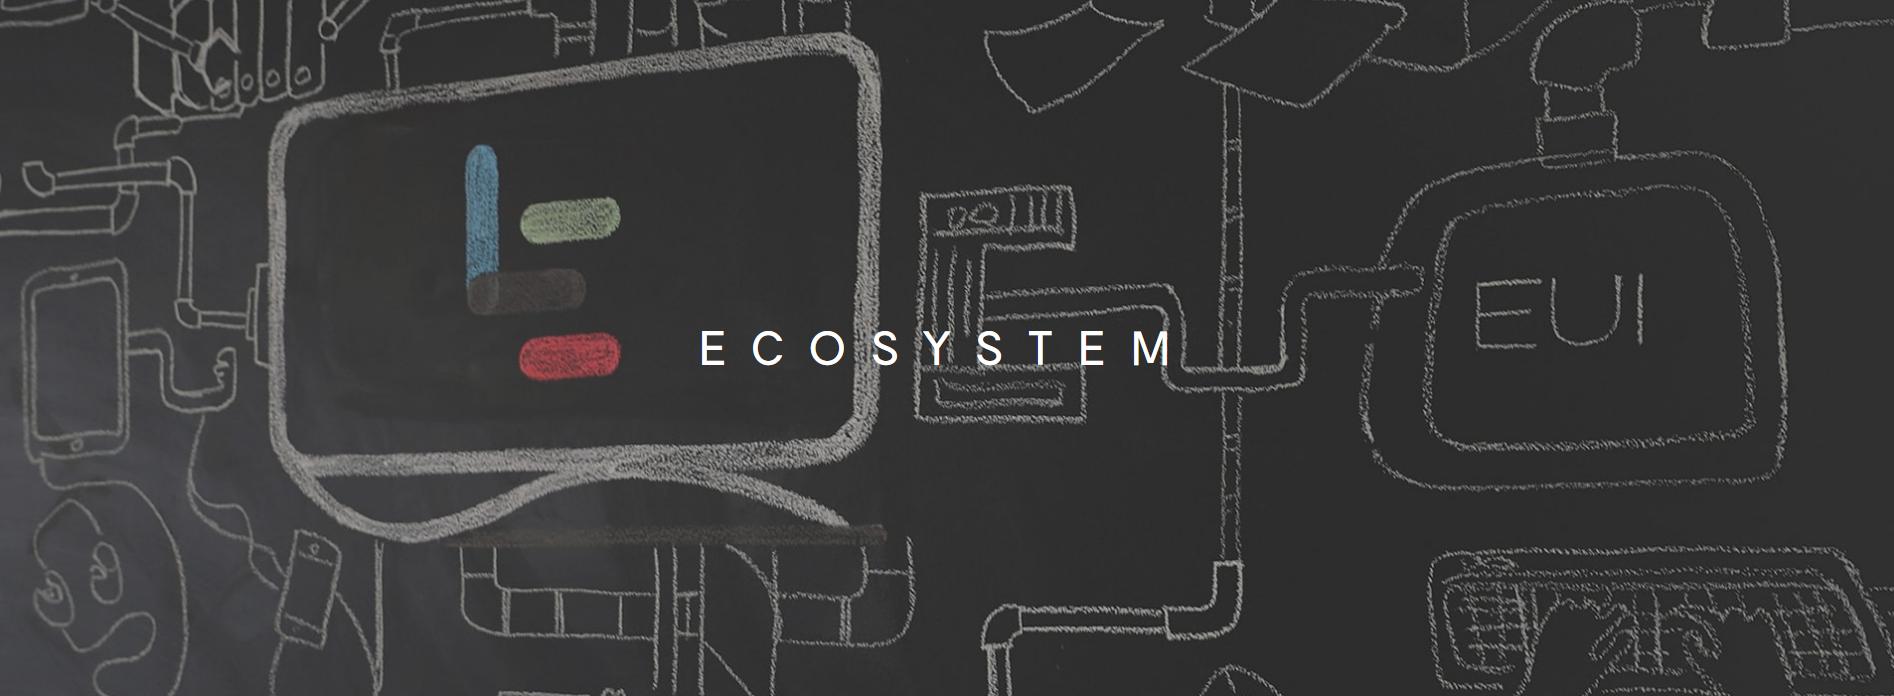 ecossistema da sanguessuga